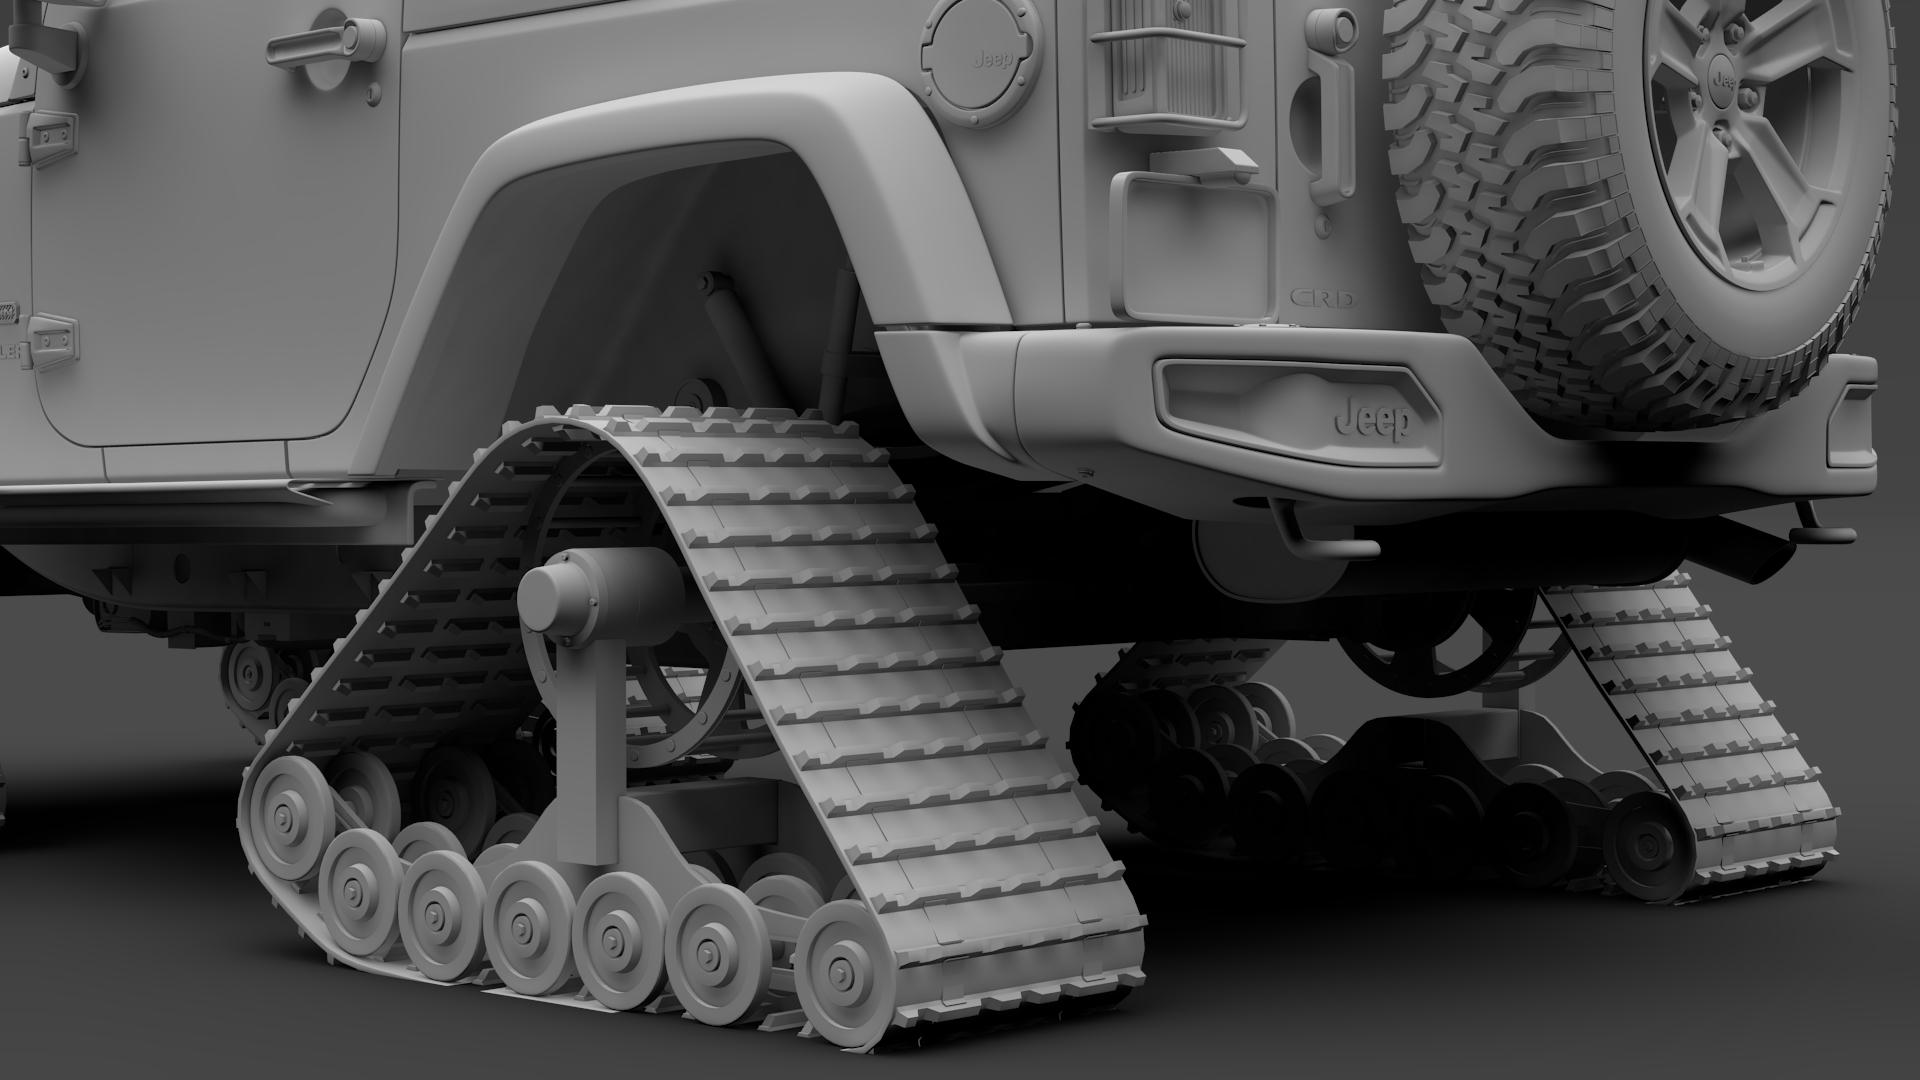 jeep wrangler crawler rubicon recon jk 2017 3d model max fbx c4d lwo ma mb hrc xsi obj 276928